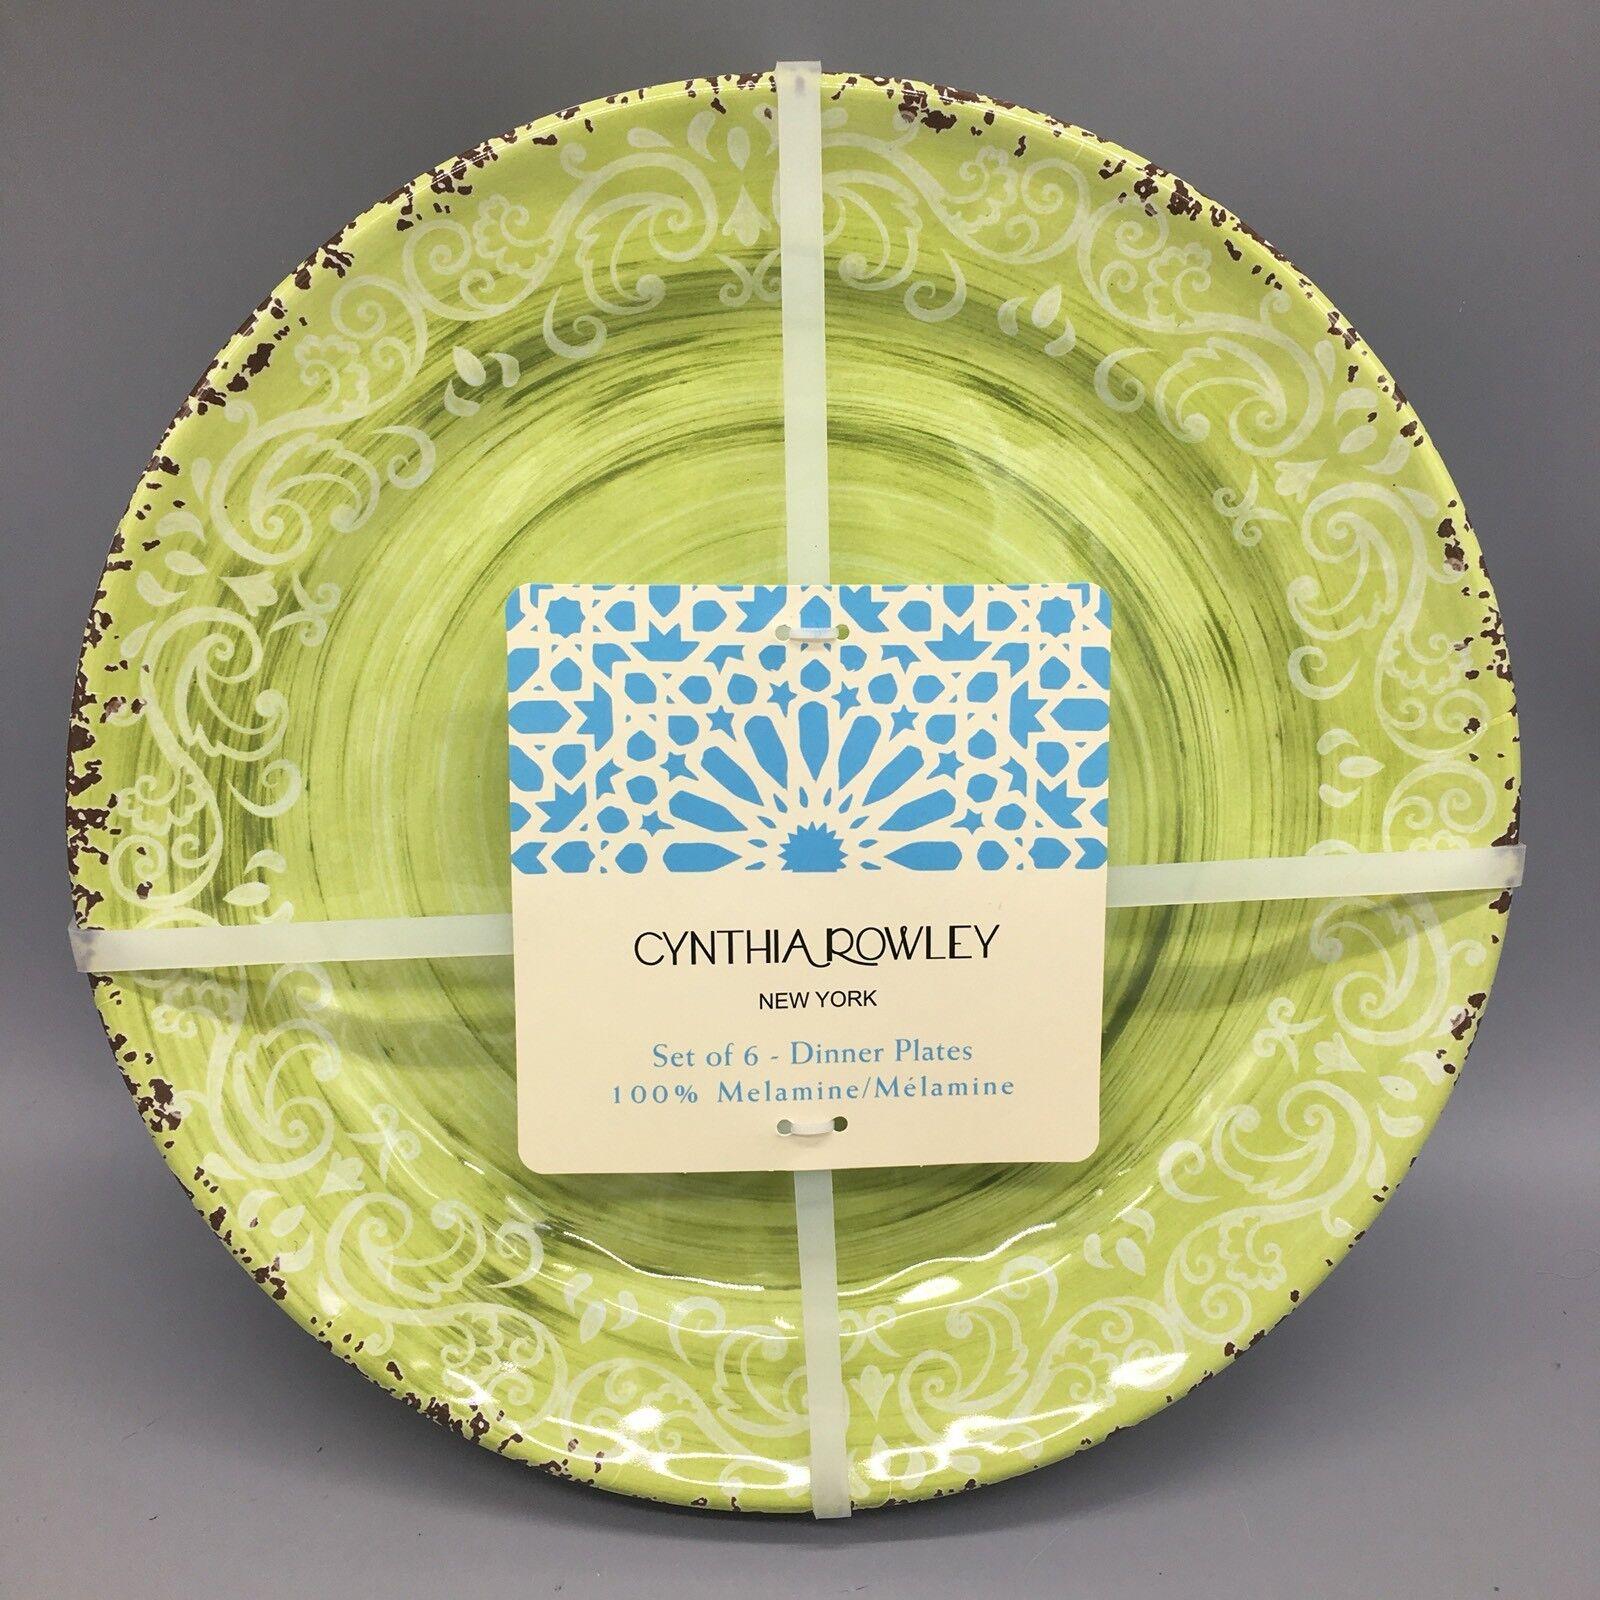 X6 Cynthia Rowley Melamine Dinner Plate Set Lime Grün Rustic Medallion Tuscan